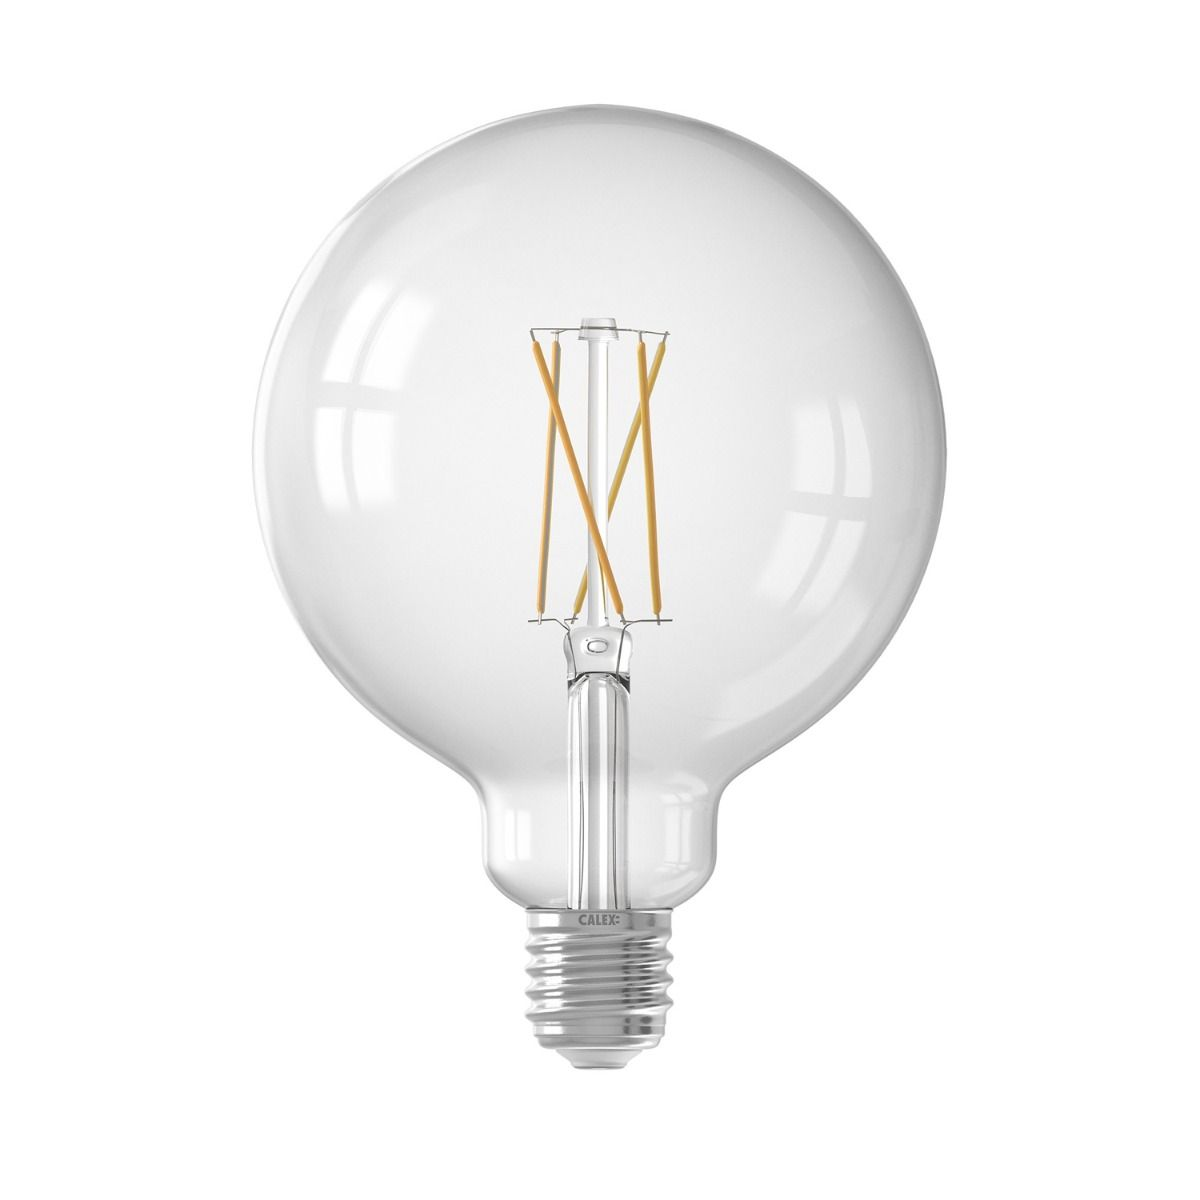 Calex Smart Globe G125 E27 7,5W 1055lm 1800-3000K Fadenlampe   Tuya Wifi